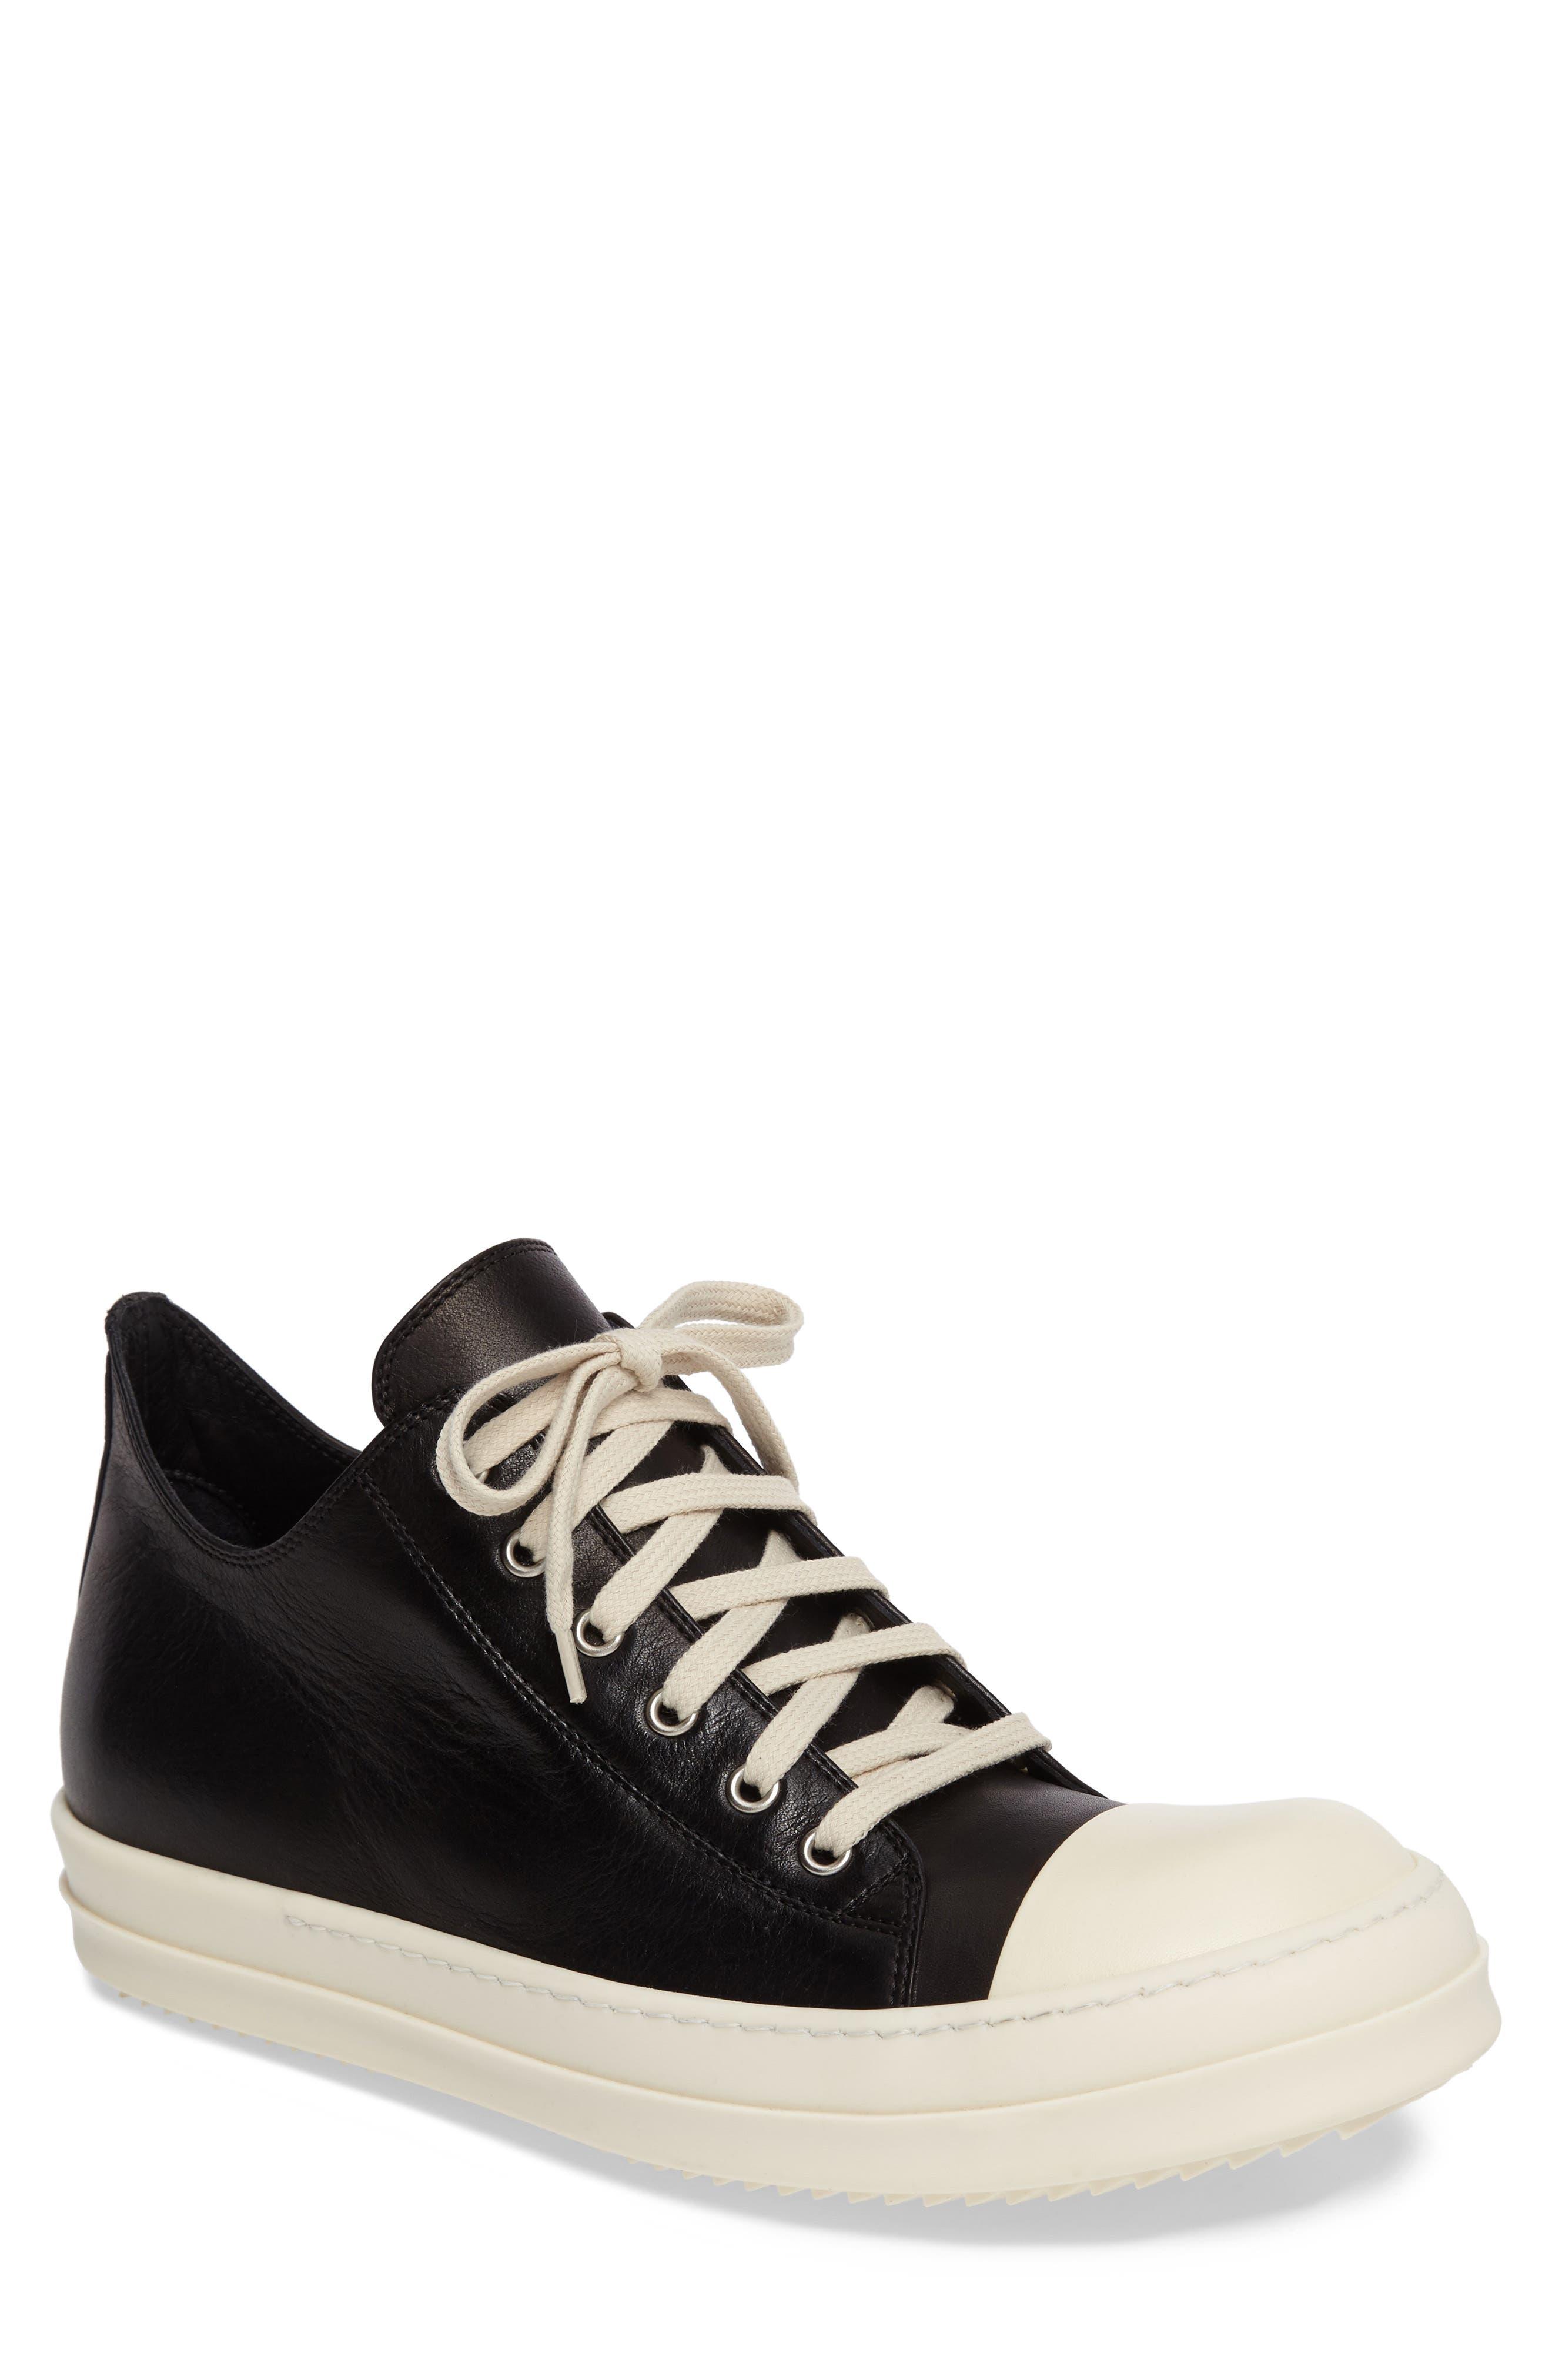 Rick Owens Low Top Sneaker (Men